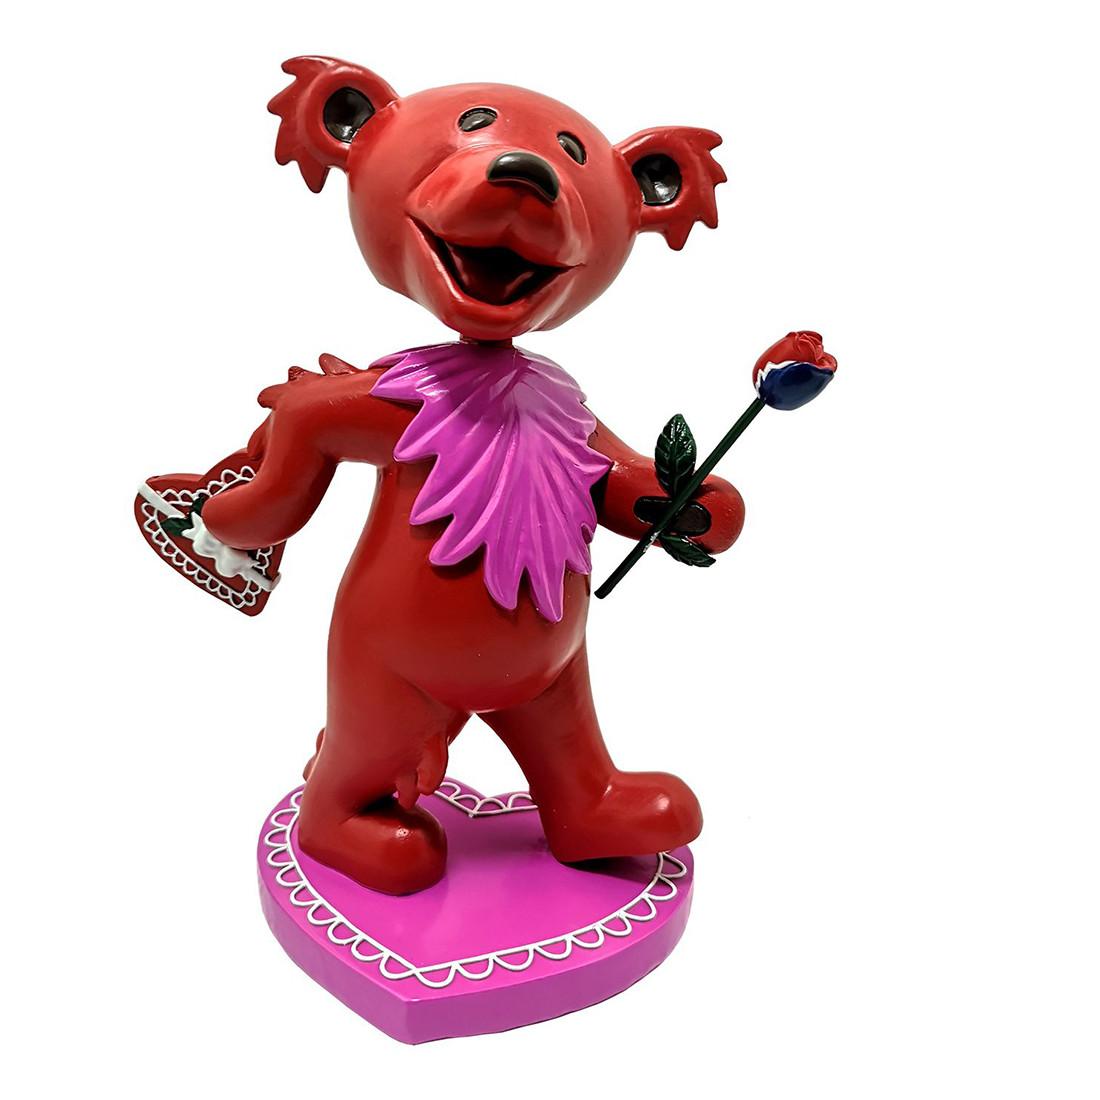 GD Bobblehead Dancing Love Bear Red